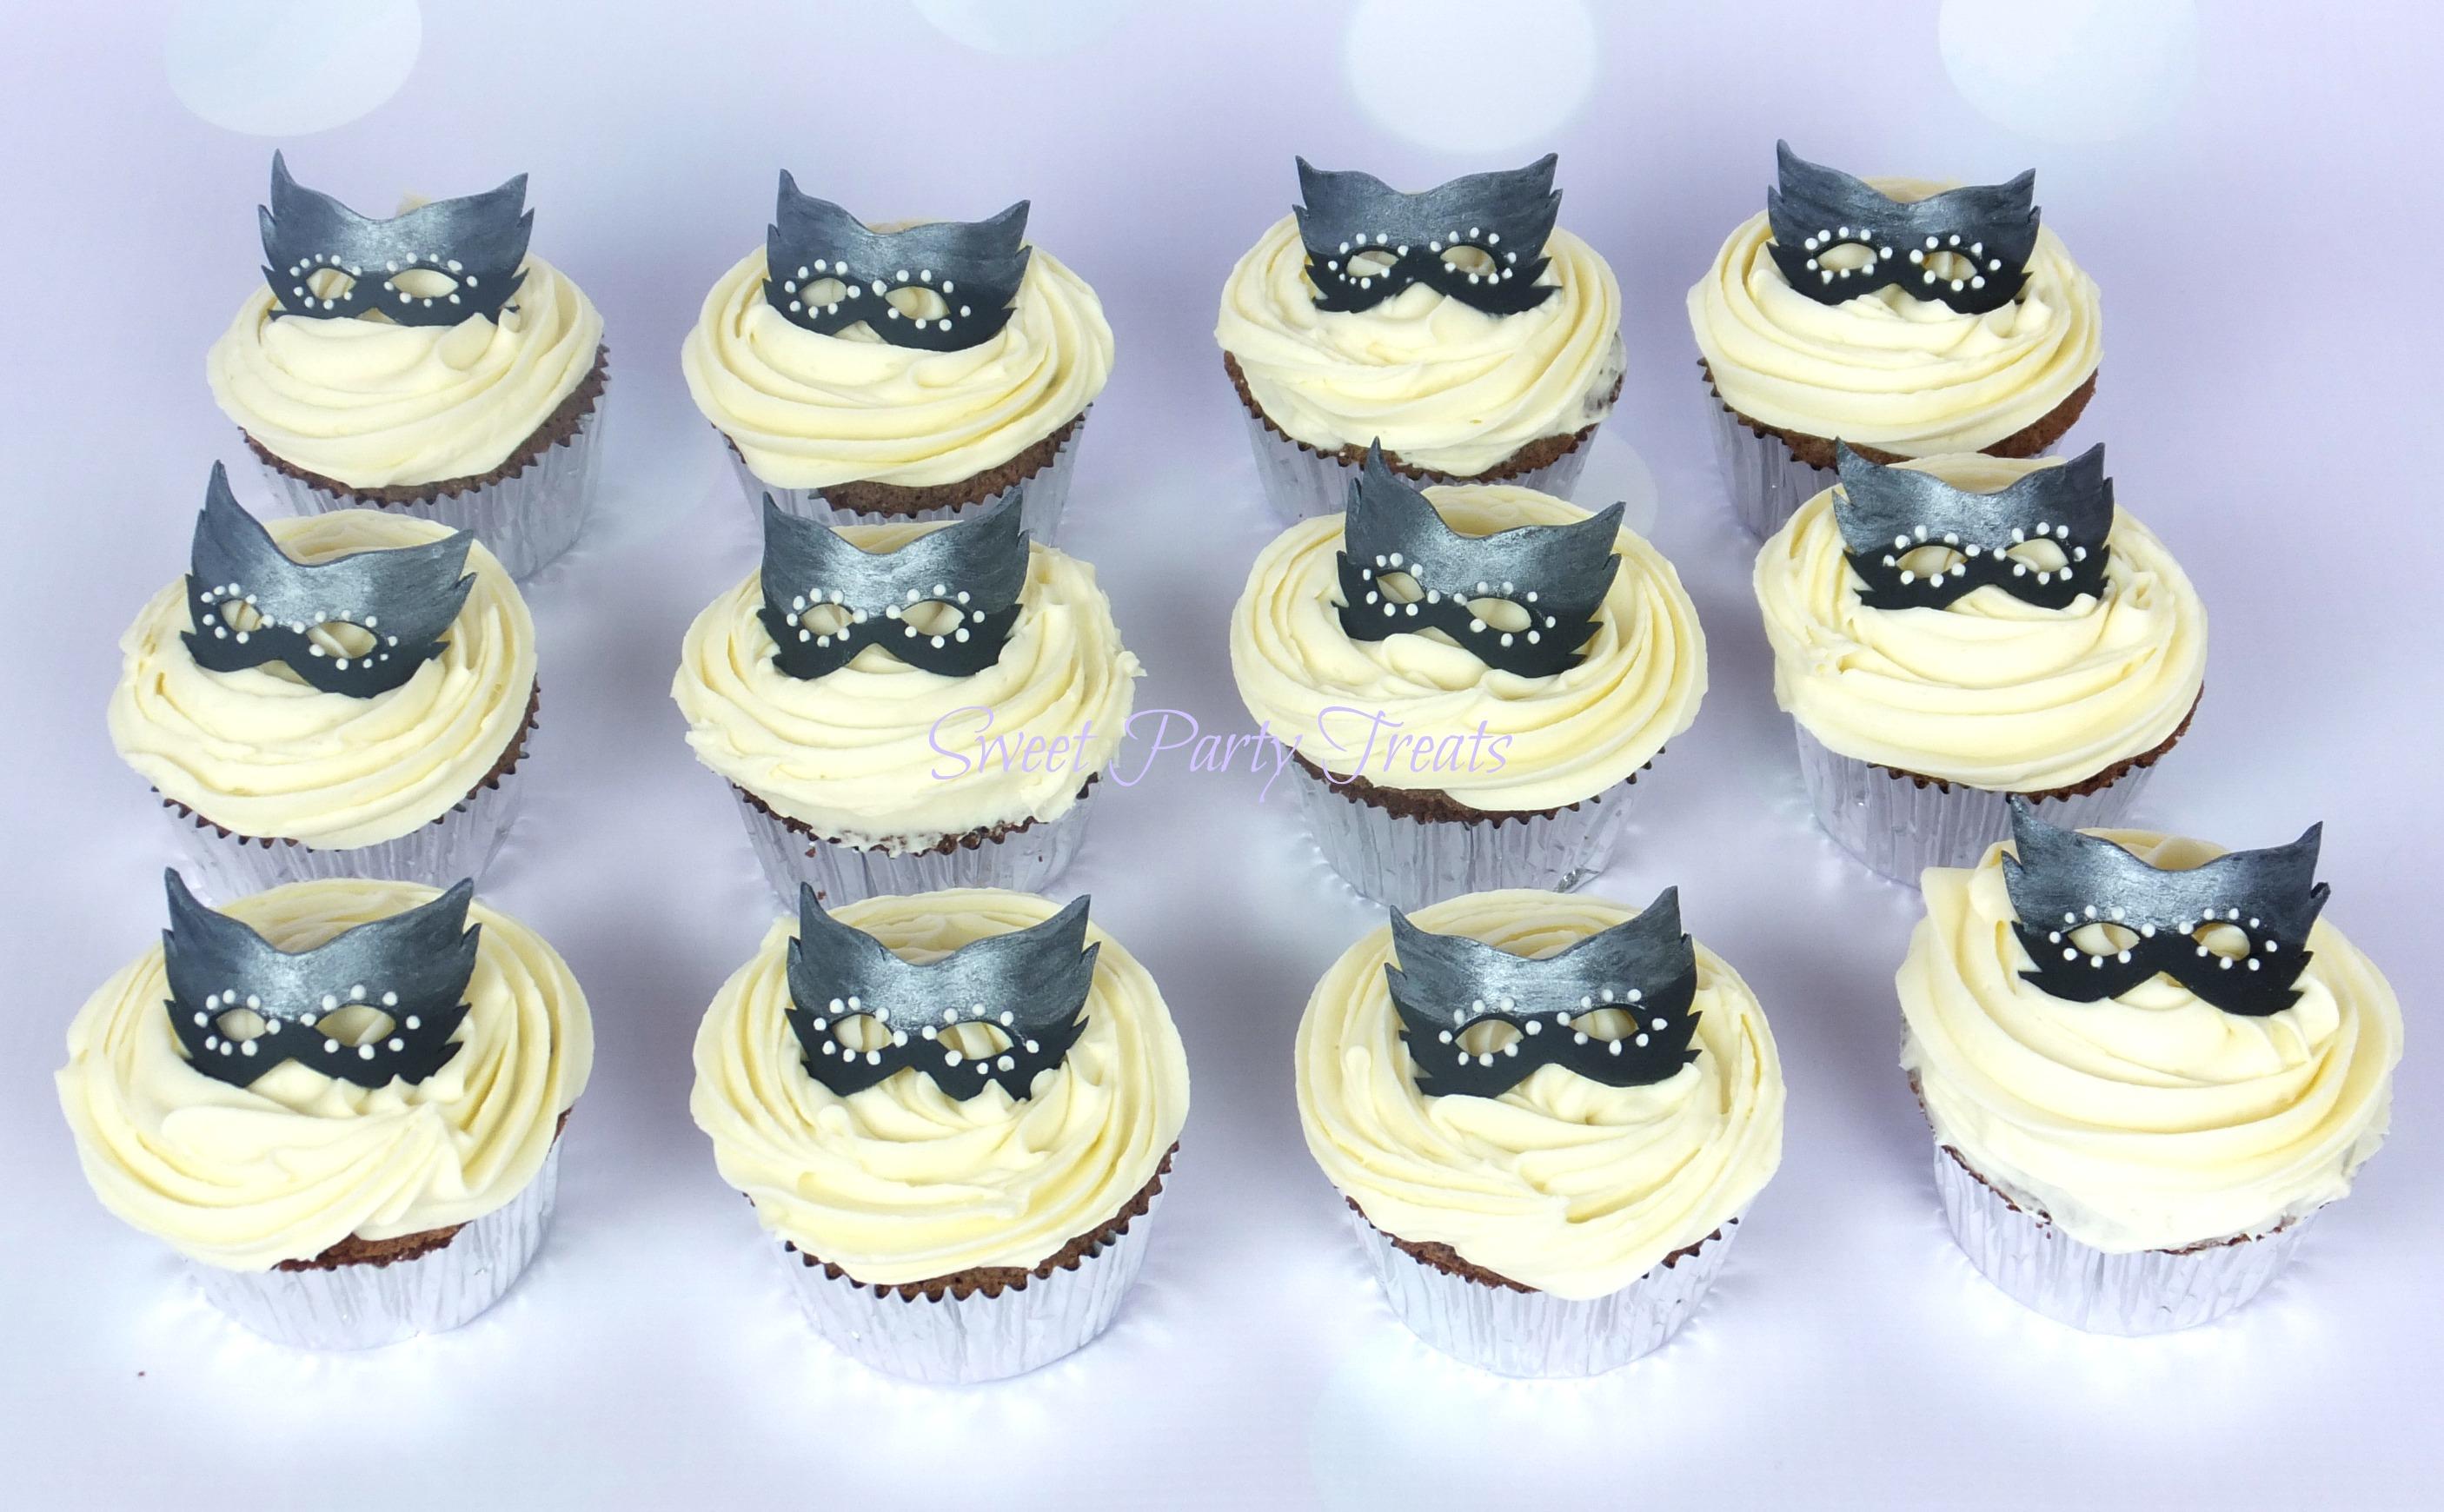 Masquerade Cupcakes Sweet Party Treats